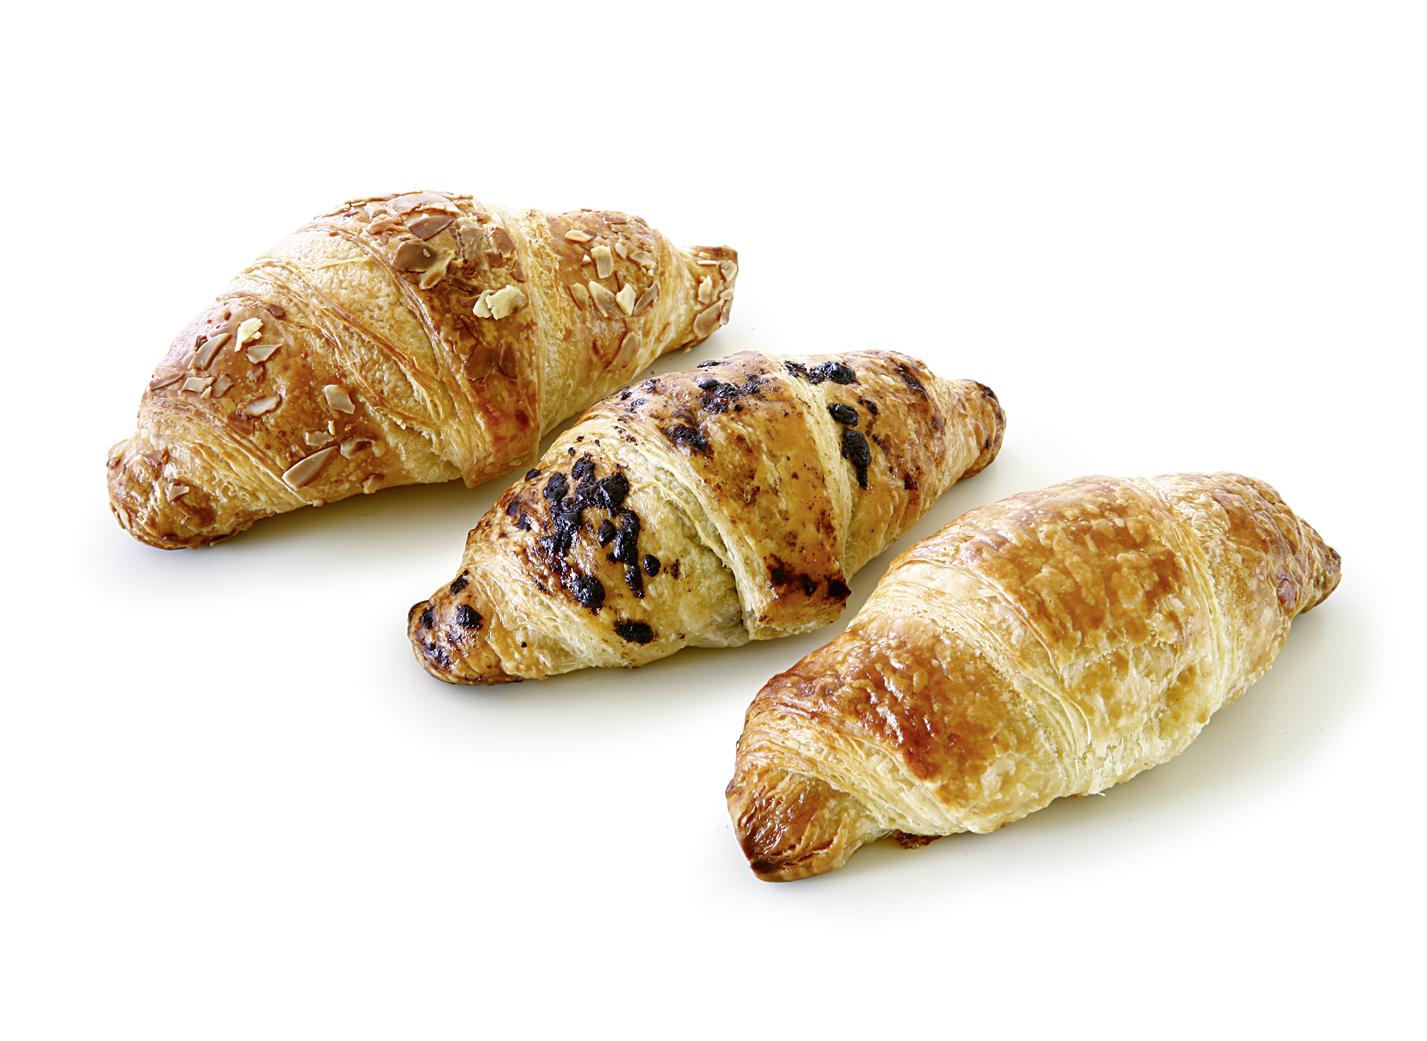 Mini Mix Butter Croissant - Mix of the varieties: nut-nougat, marzipan, apricot